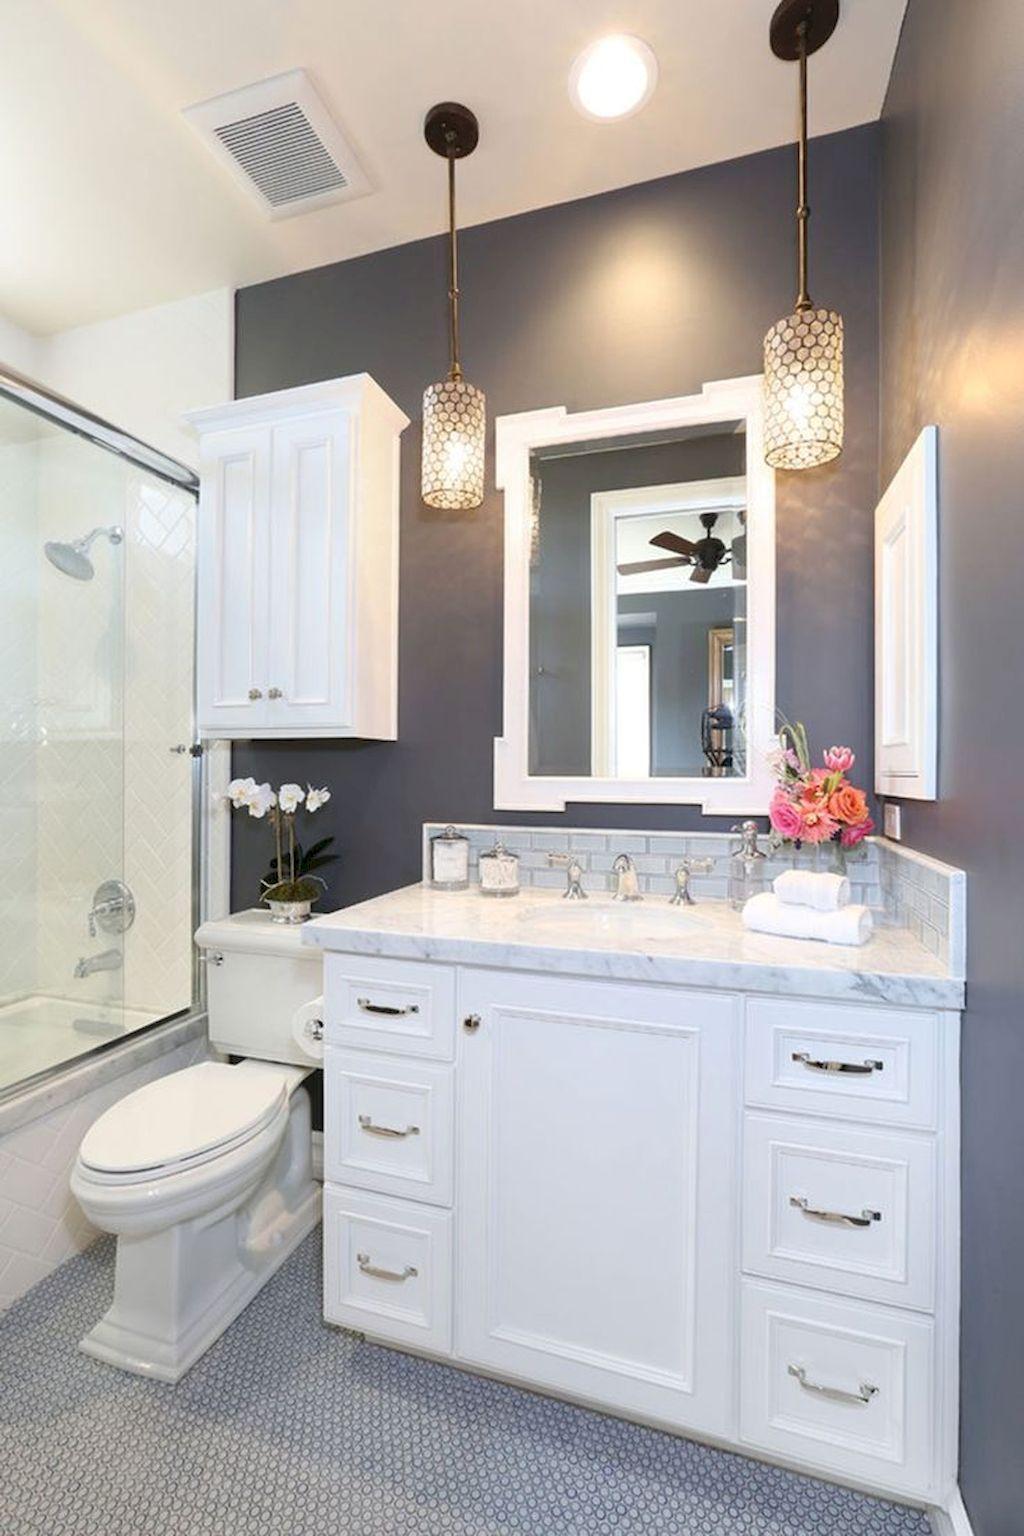 18 Beautiful Half Bathroom Ideas to Inspire You | Small bathroom ...